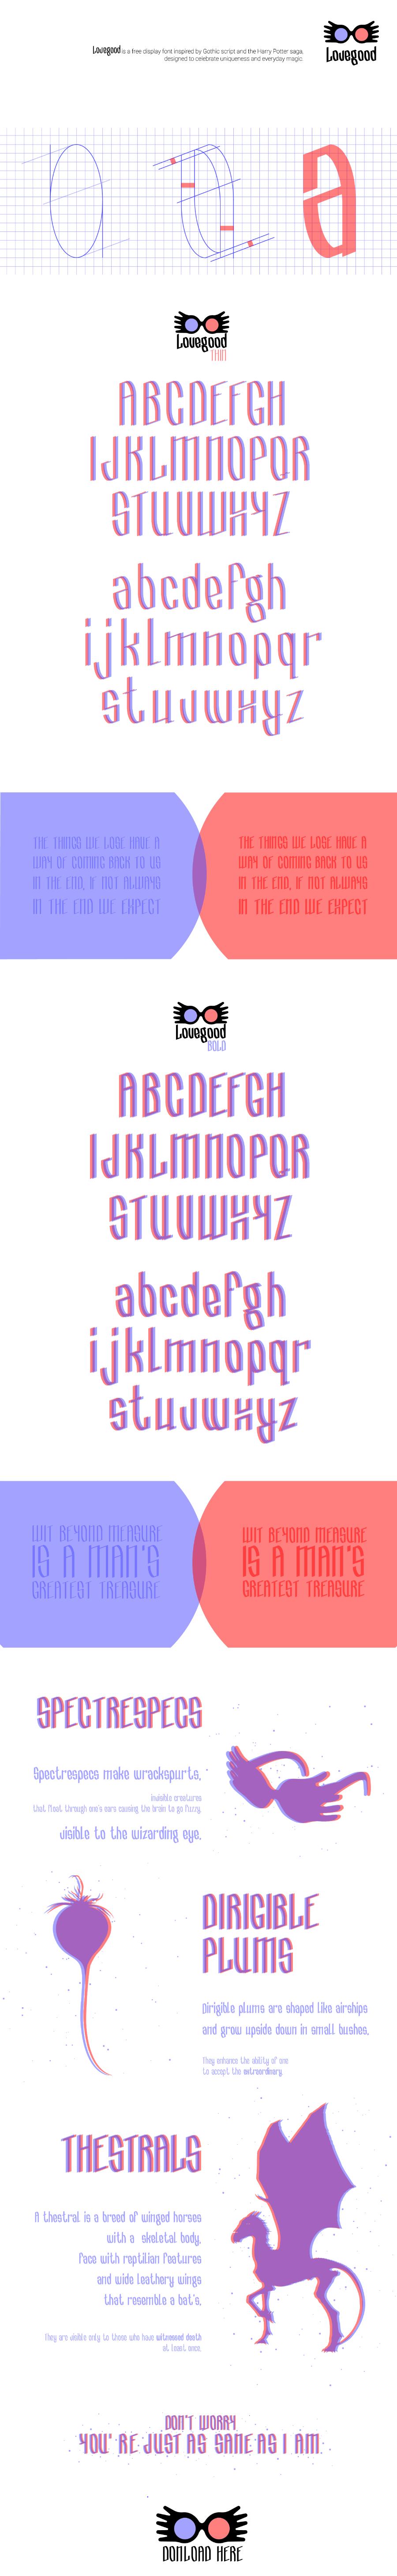 Elisavet-Zioga_Lovegood-free-typeface_300517_prev01